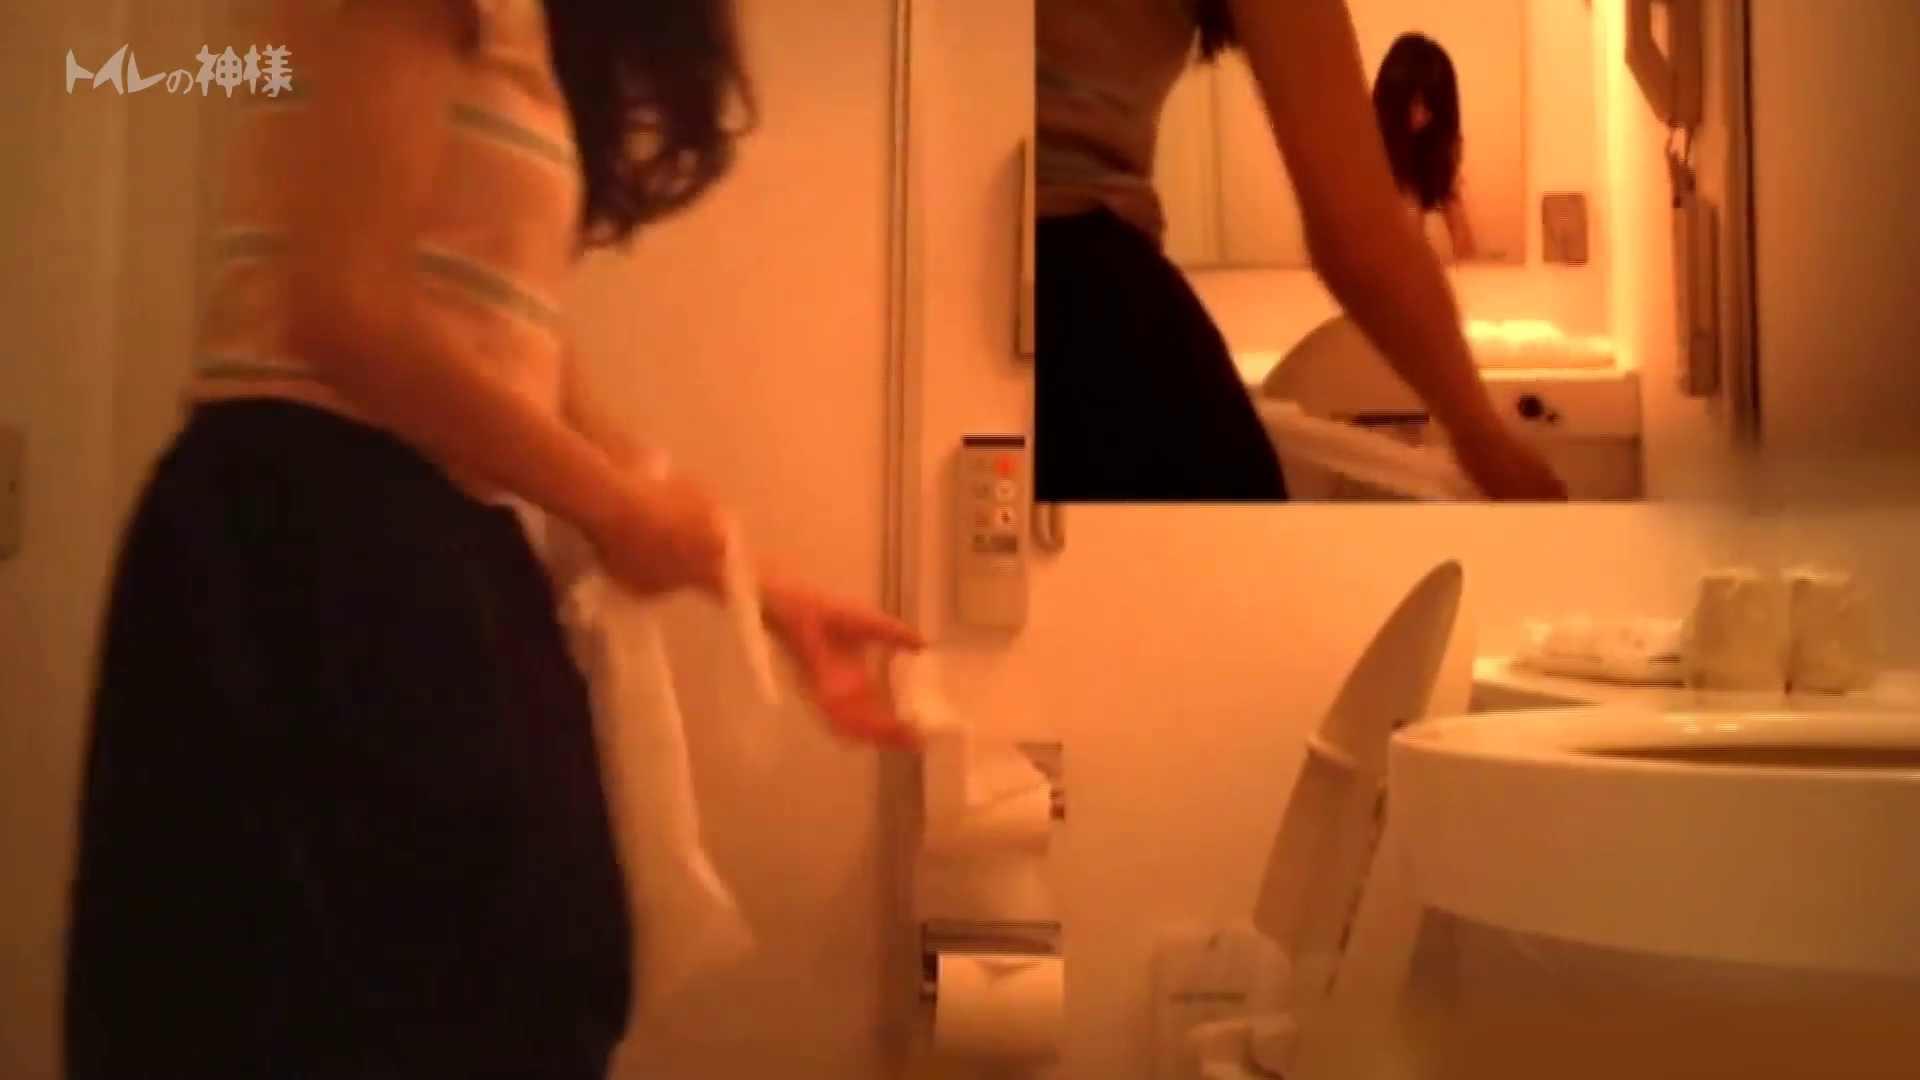 Vol.04 女子大生のトイレ恥態 OLハメ撮り  104Pix 71